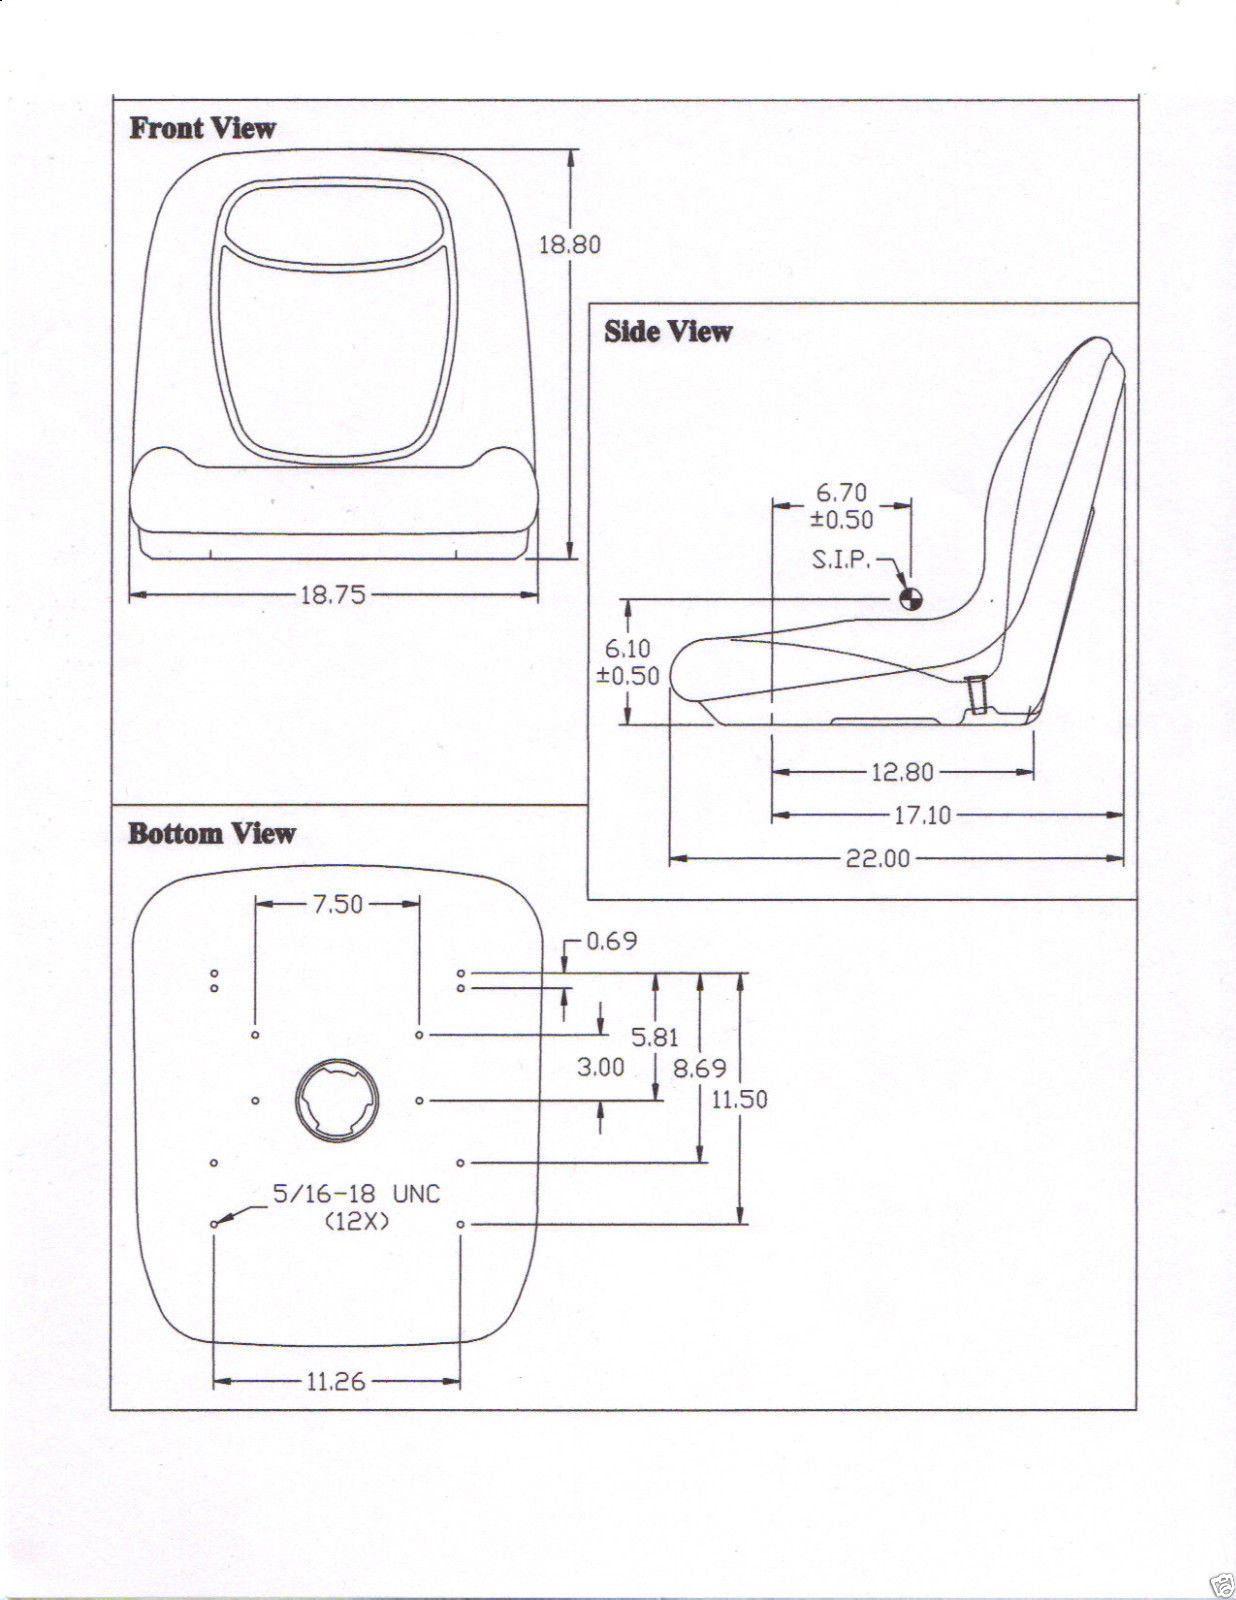 2000 John Deere 4600 Wiring Diagram And Ebooks 2320 Seat 4200 4300 4400 4500 4700 4210 4310 4410 Rh Warehouse Com Electrical Schematics